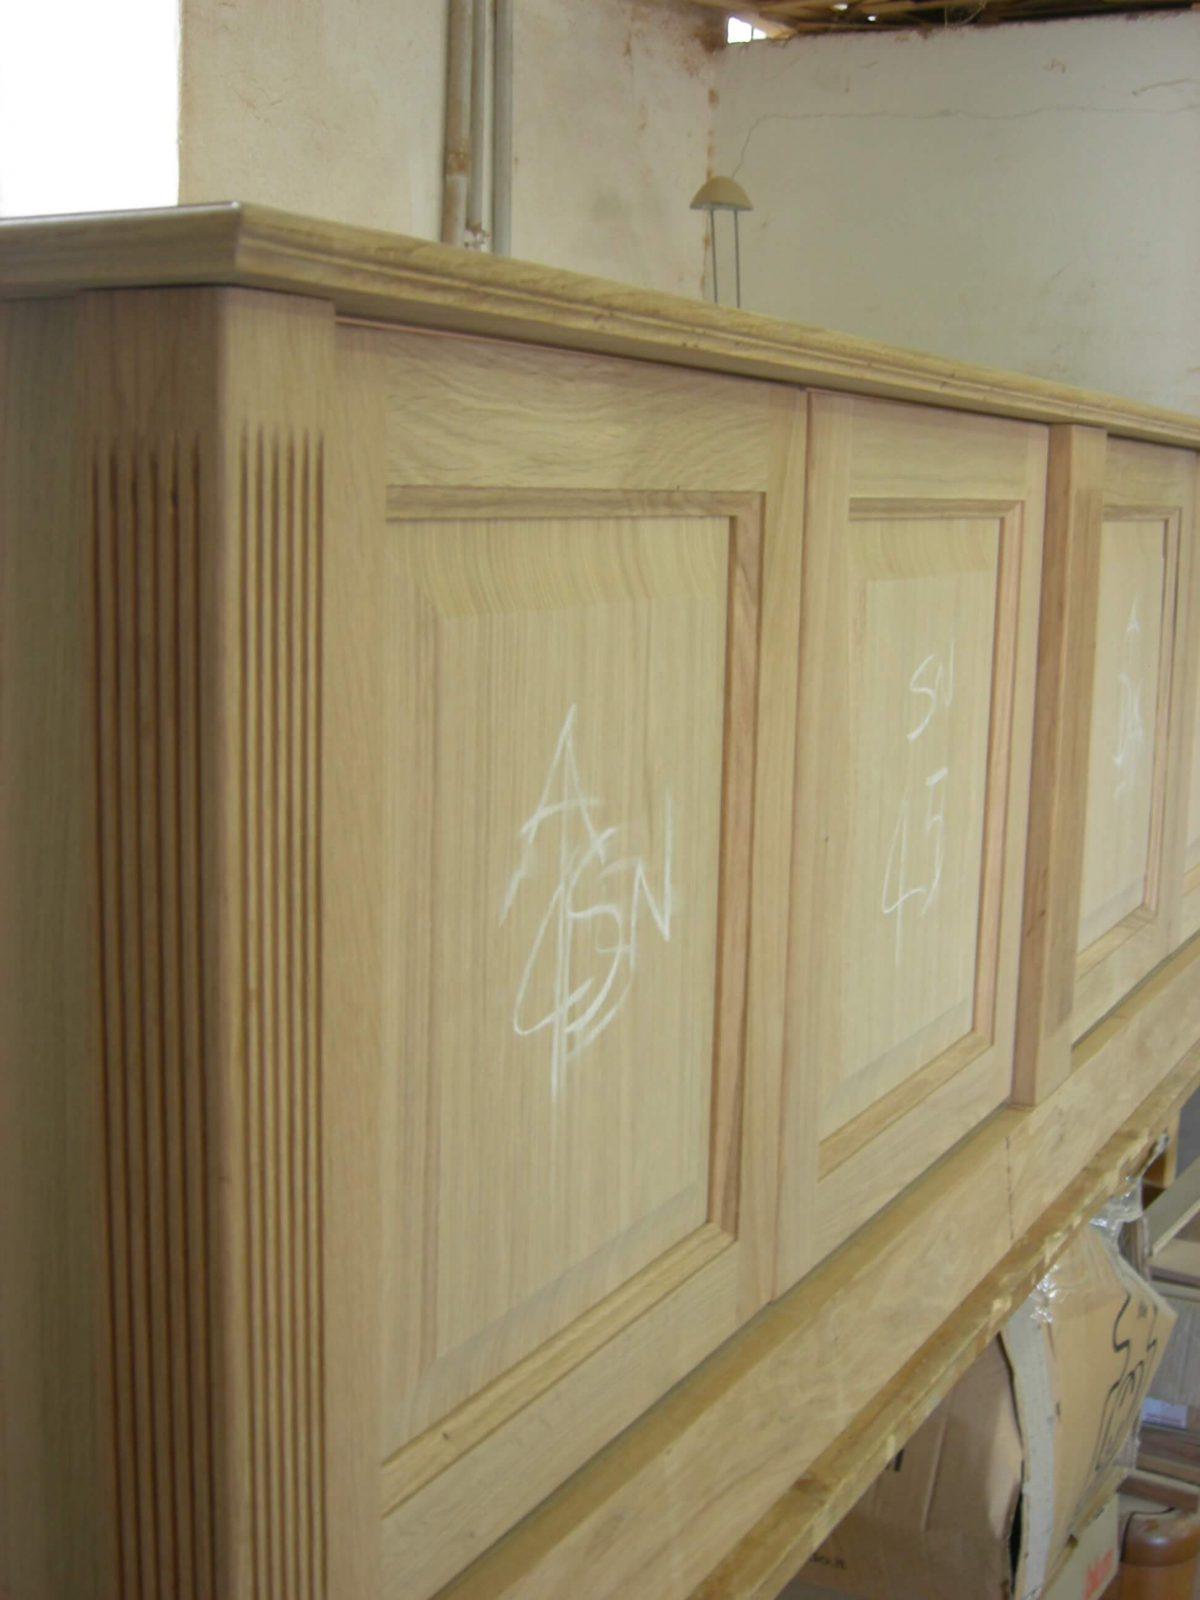 Bespoke classic Oak furniture and cabinetery